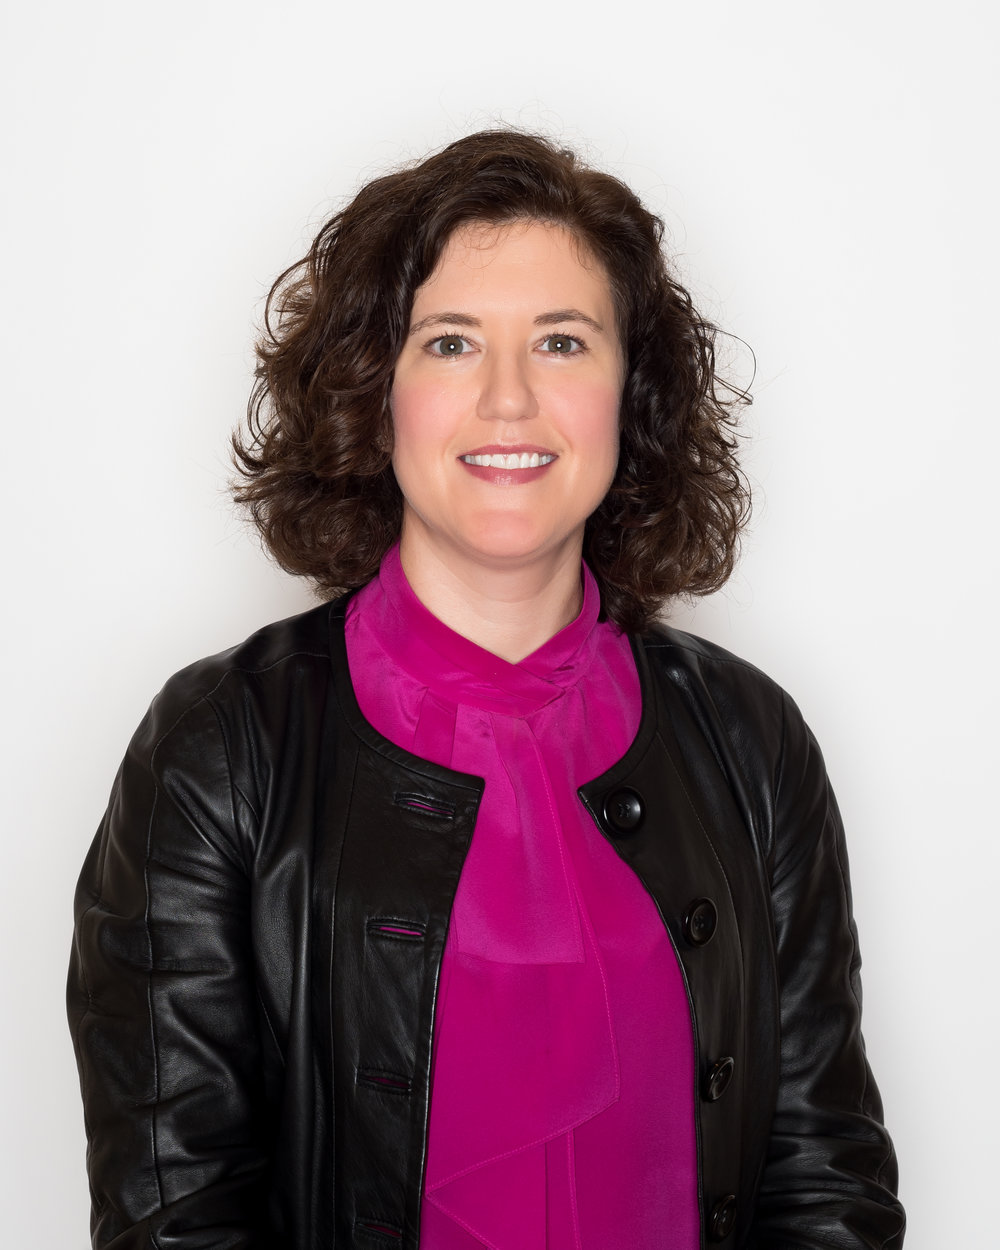 Joanna Beck - Founder & CEO